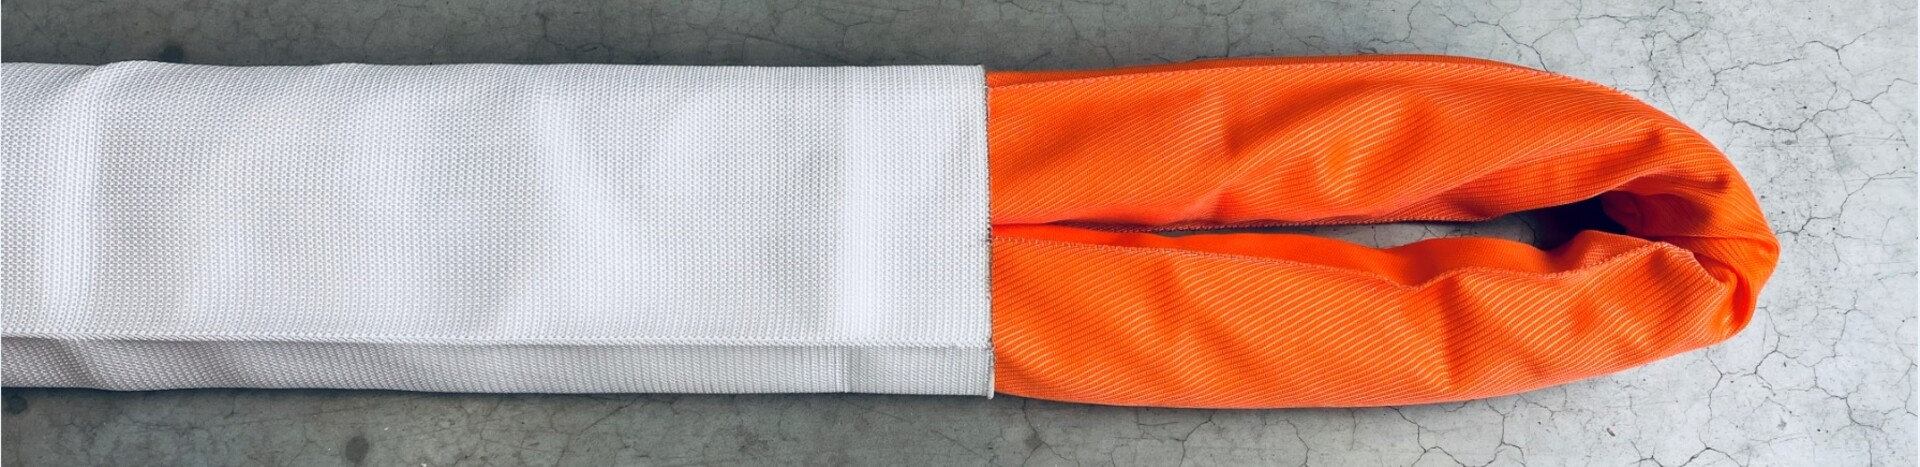 sling protection Dyneema